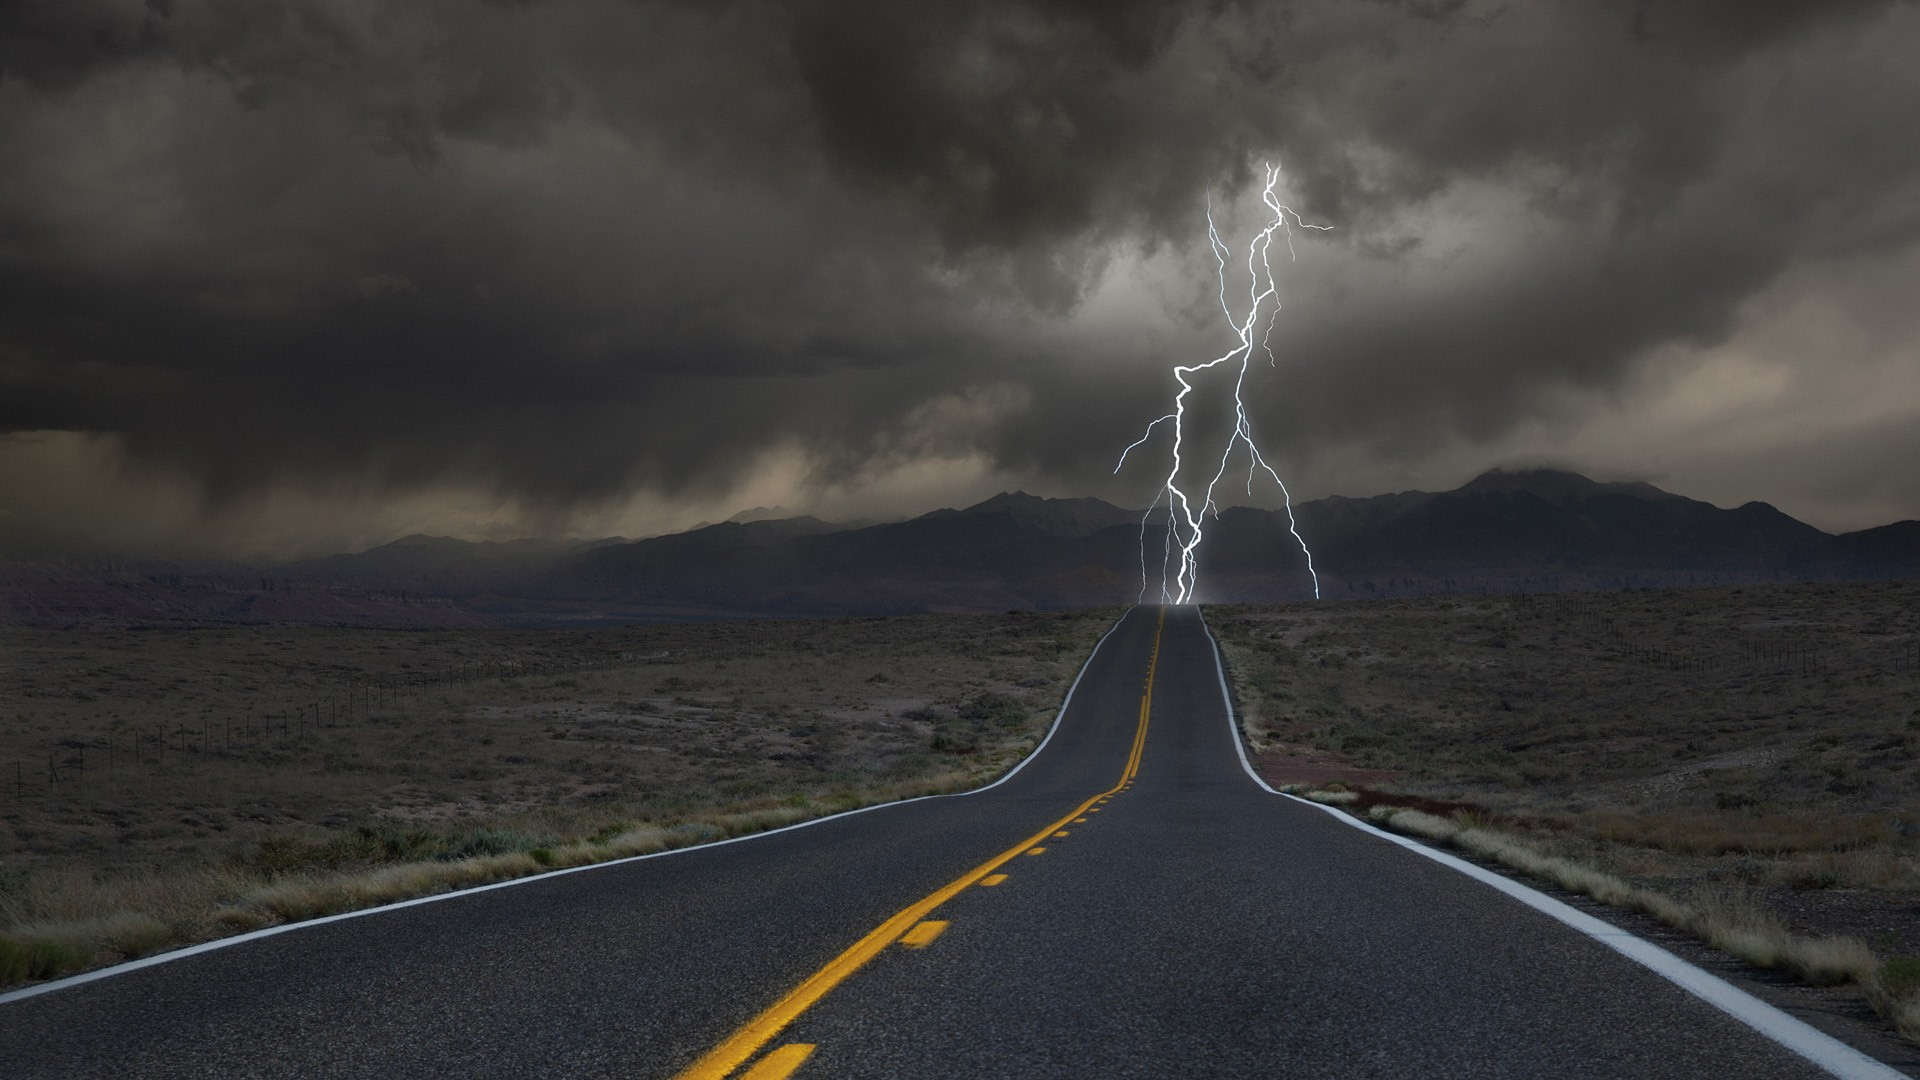 storm-clouds-54